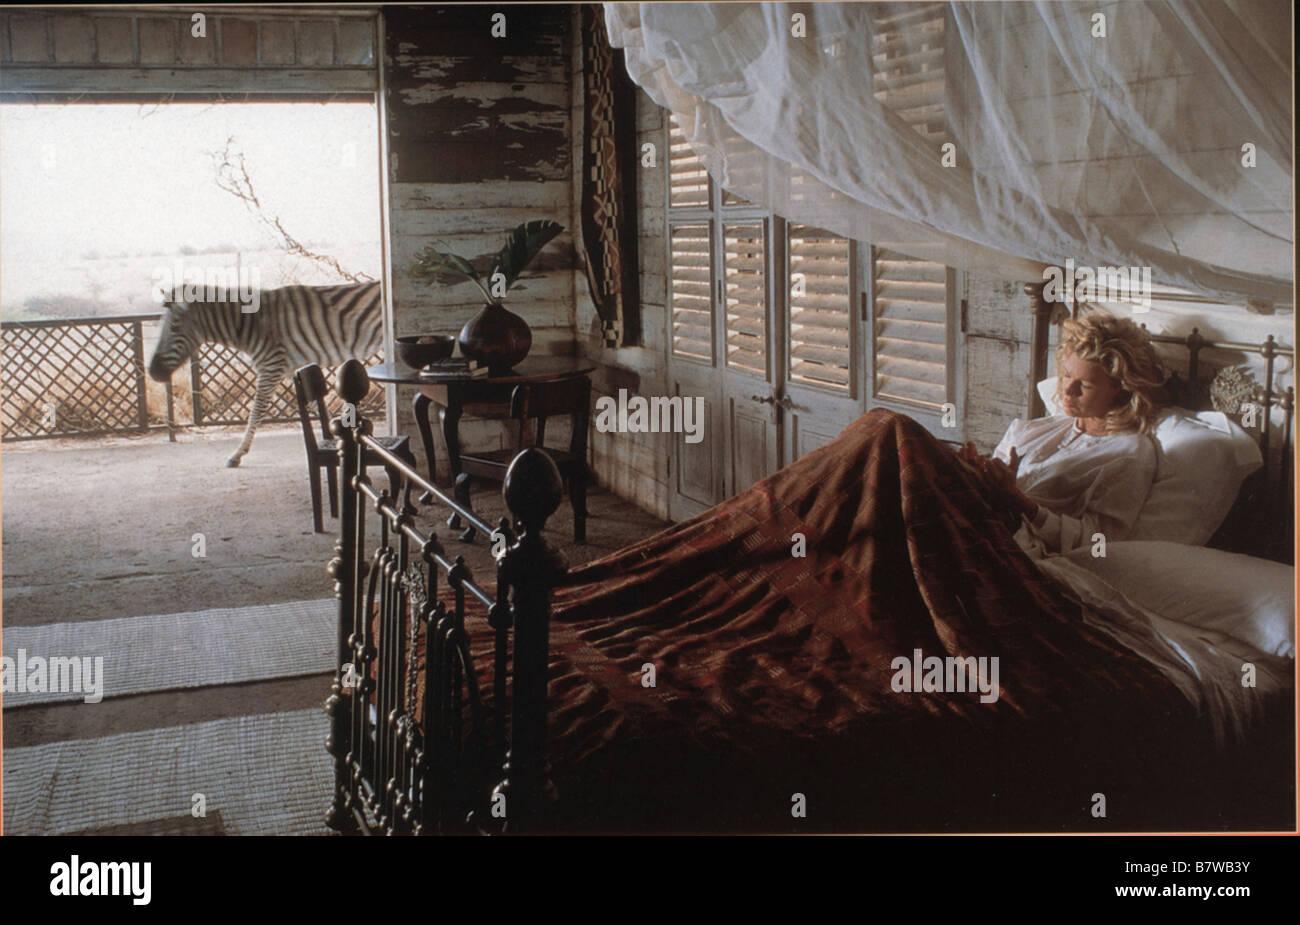 Je rêvais de l'Afrique I Dreamed of Africa  2000 USA Kim Basinger  Director: Hugh Hudson - Stock Image